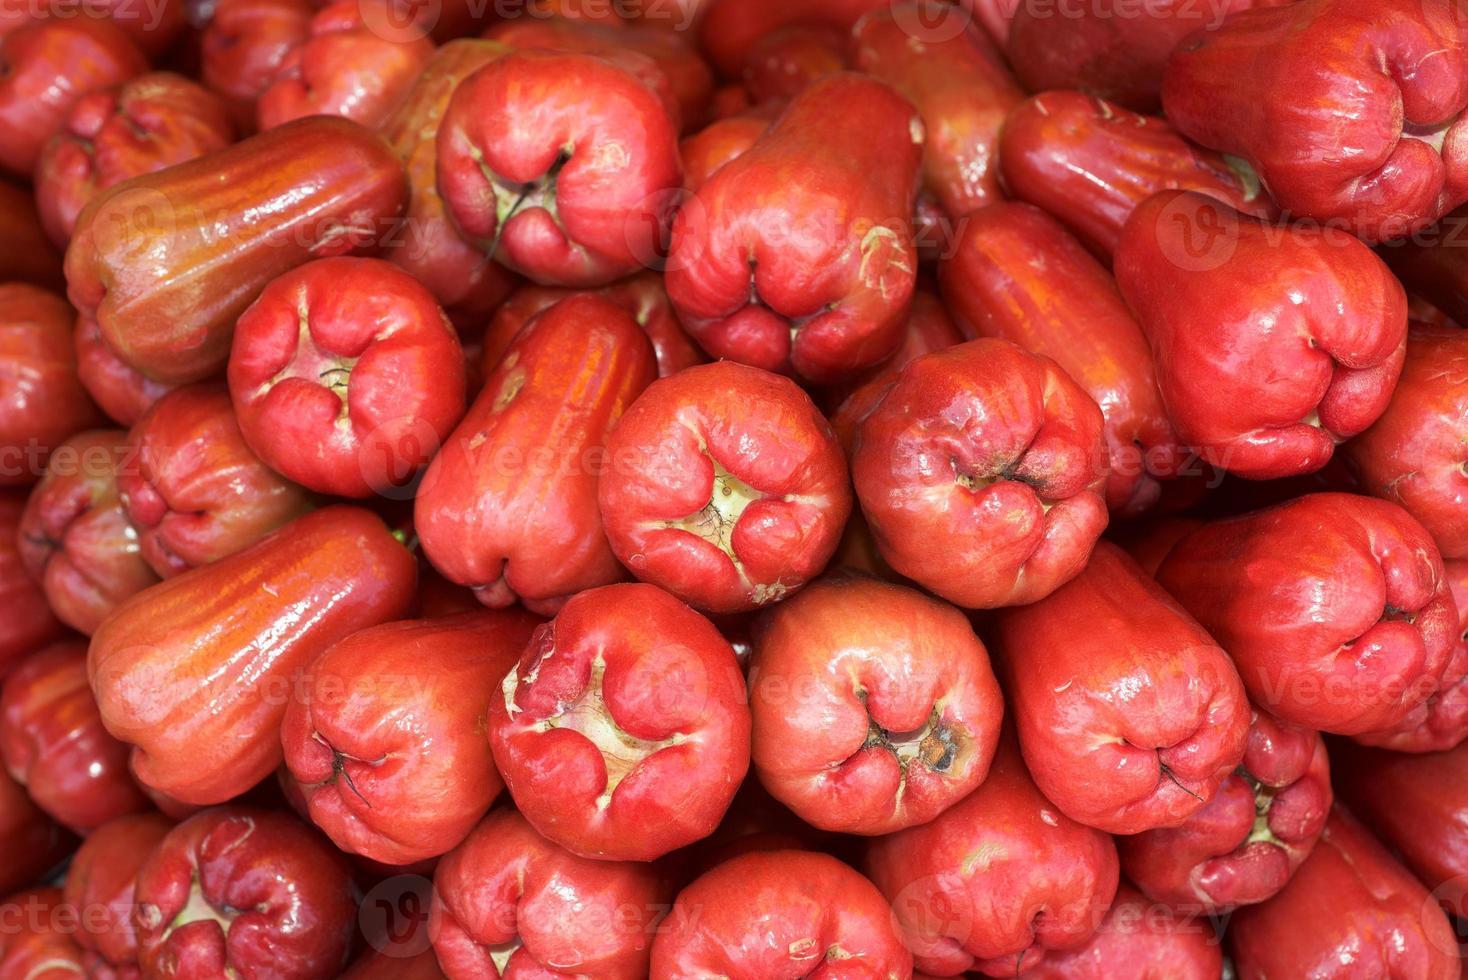 rose appels op groenten markt foto